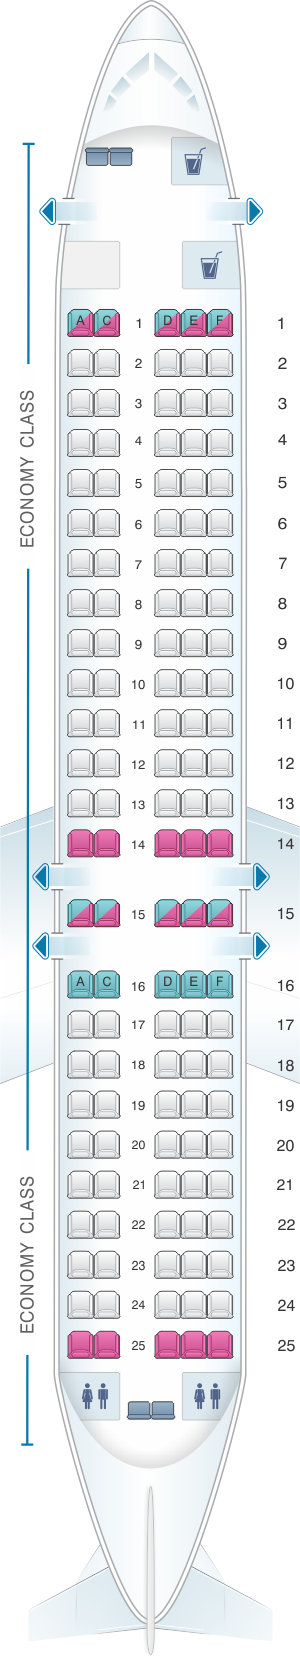 Seat map for Qantas Airways Boeing B717 200 125PAX